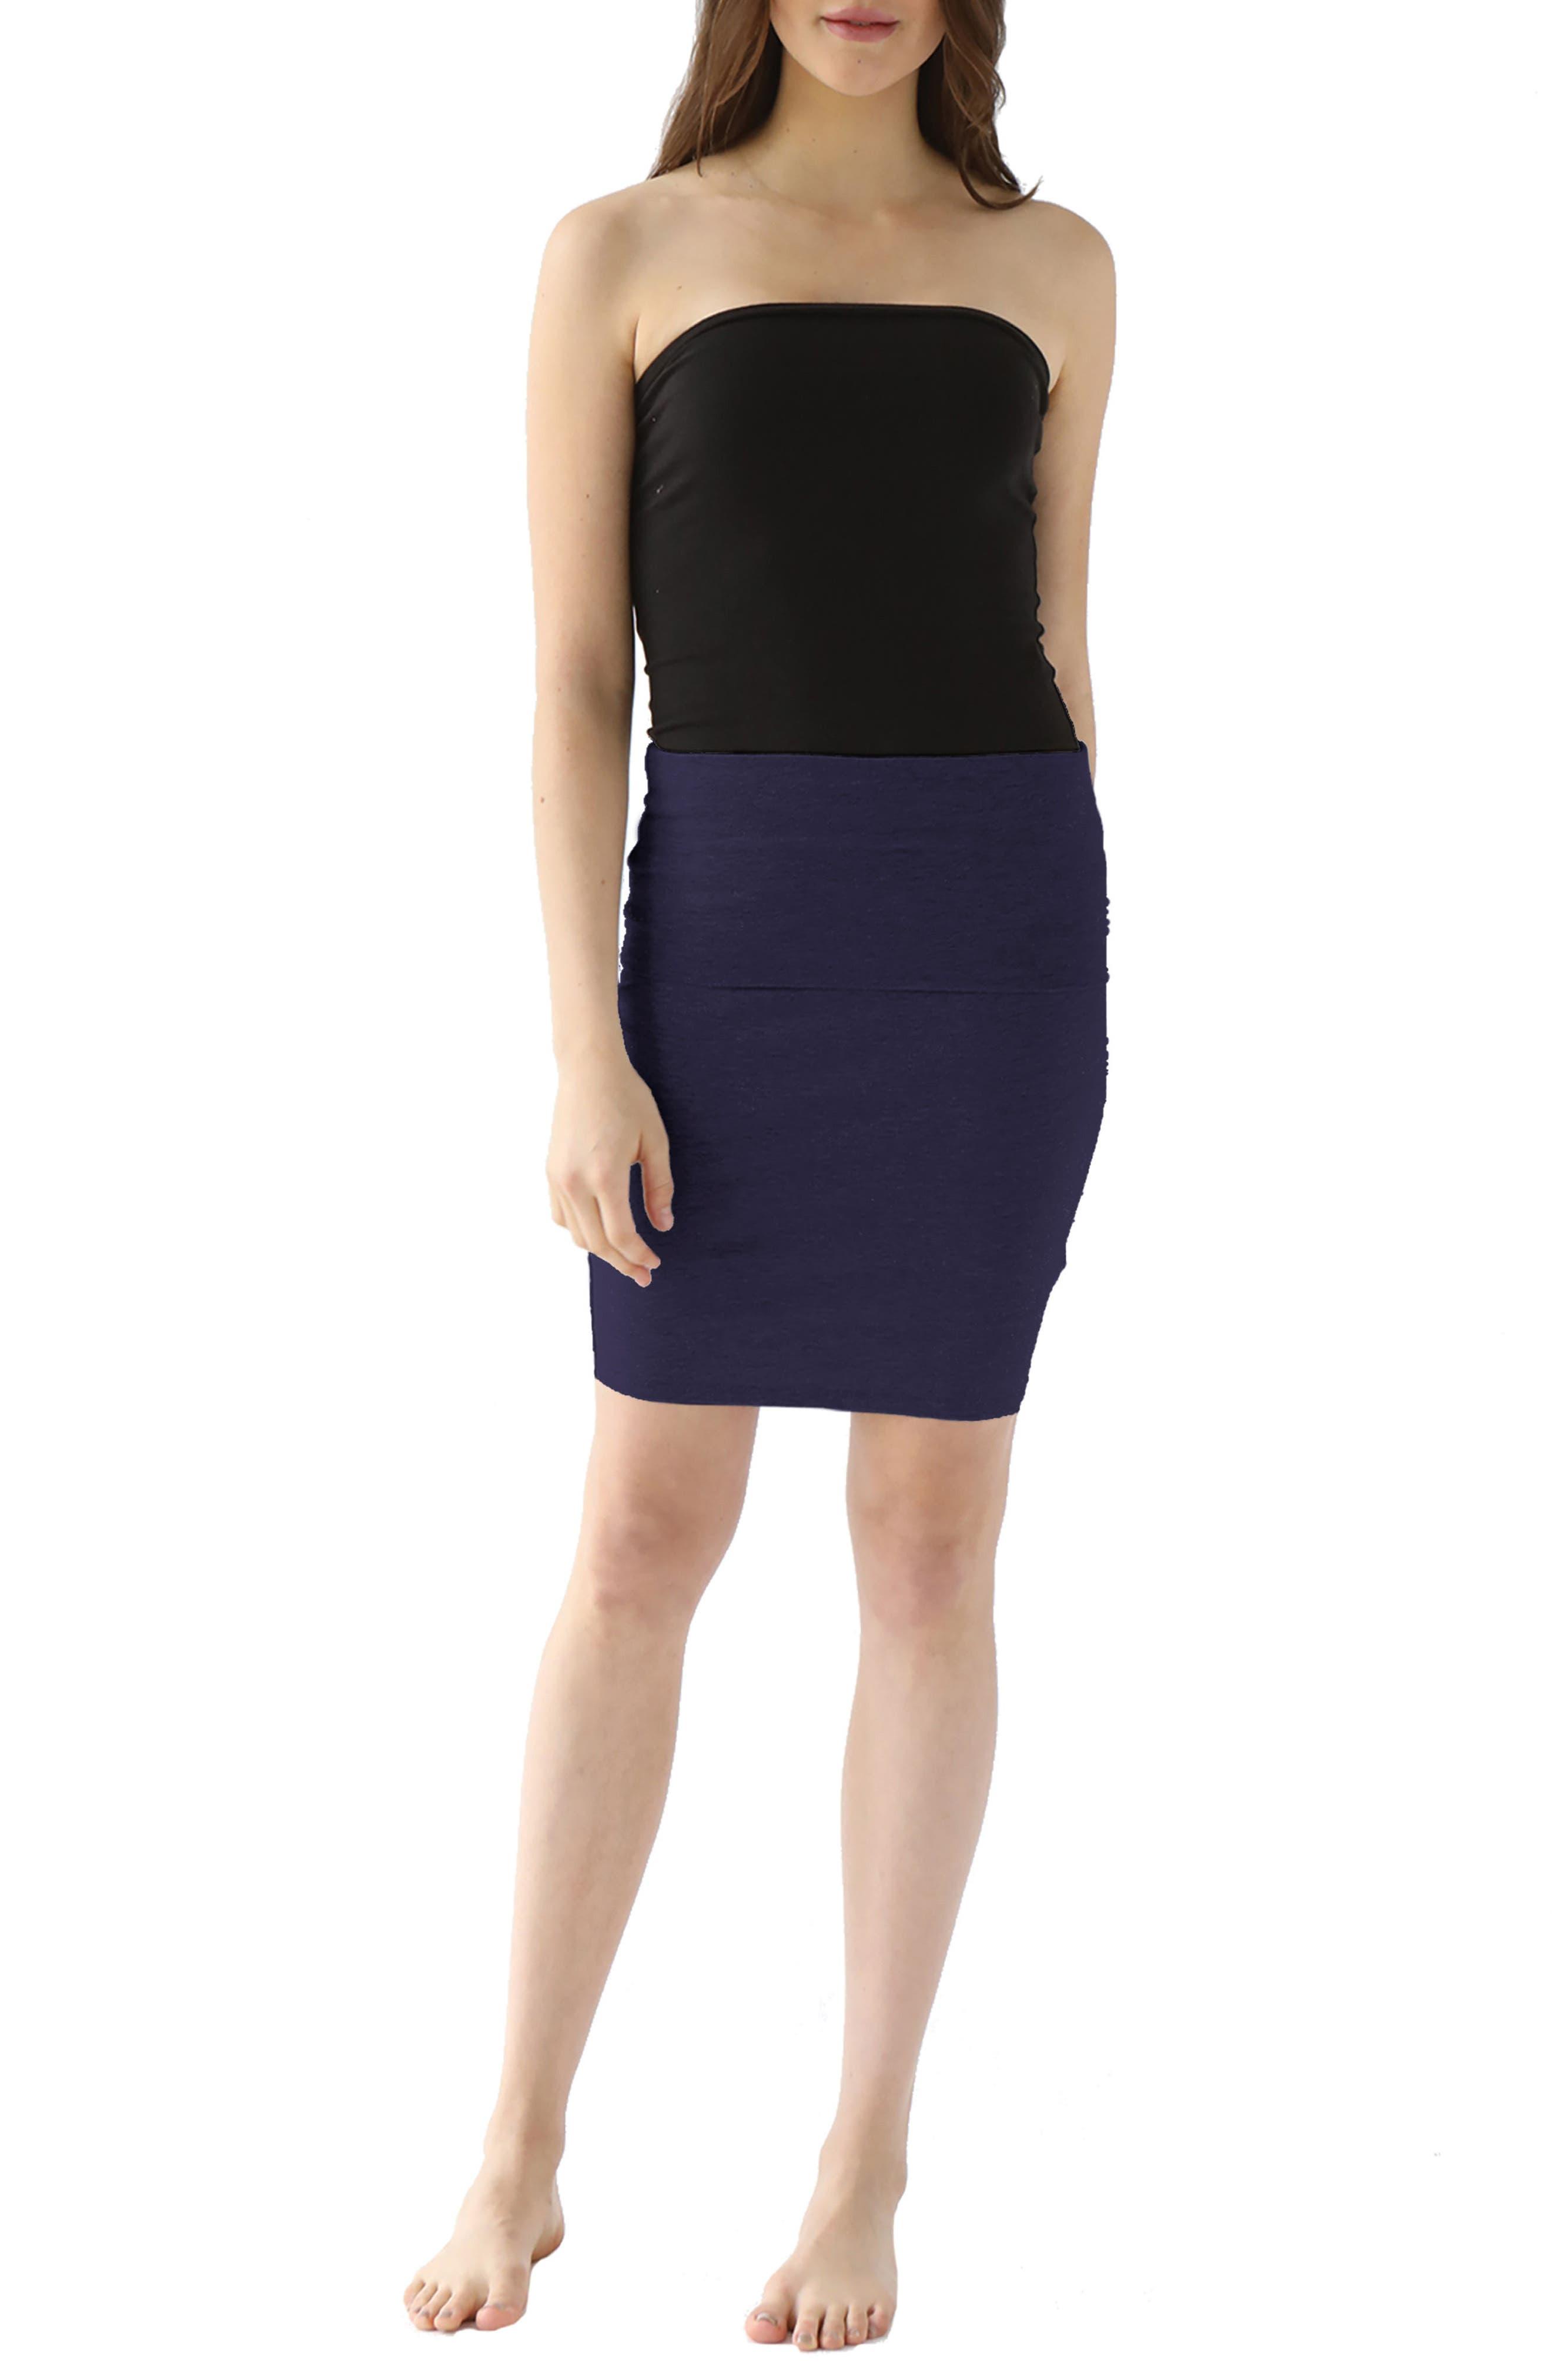 LAmade Trina Foldover Stretch Cotton Skirt